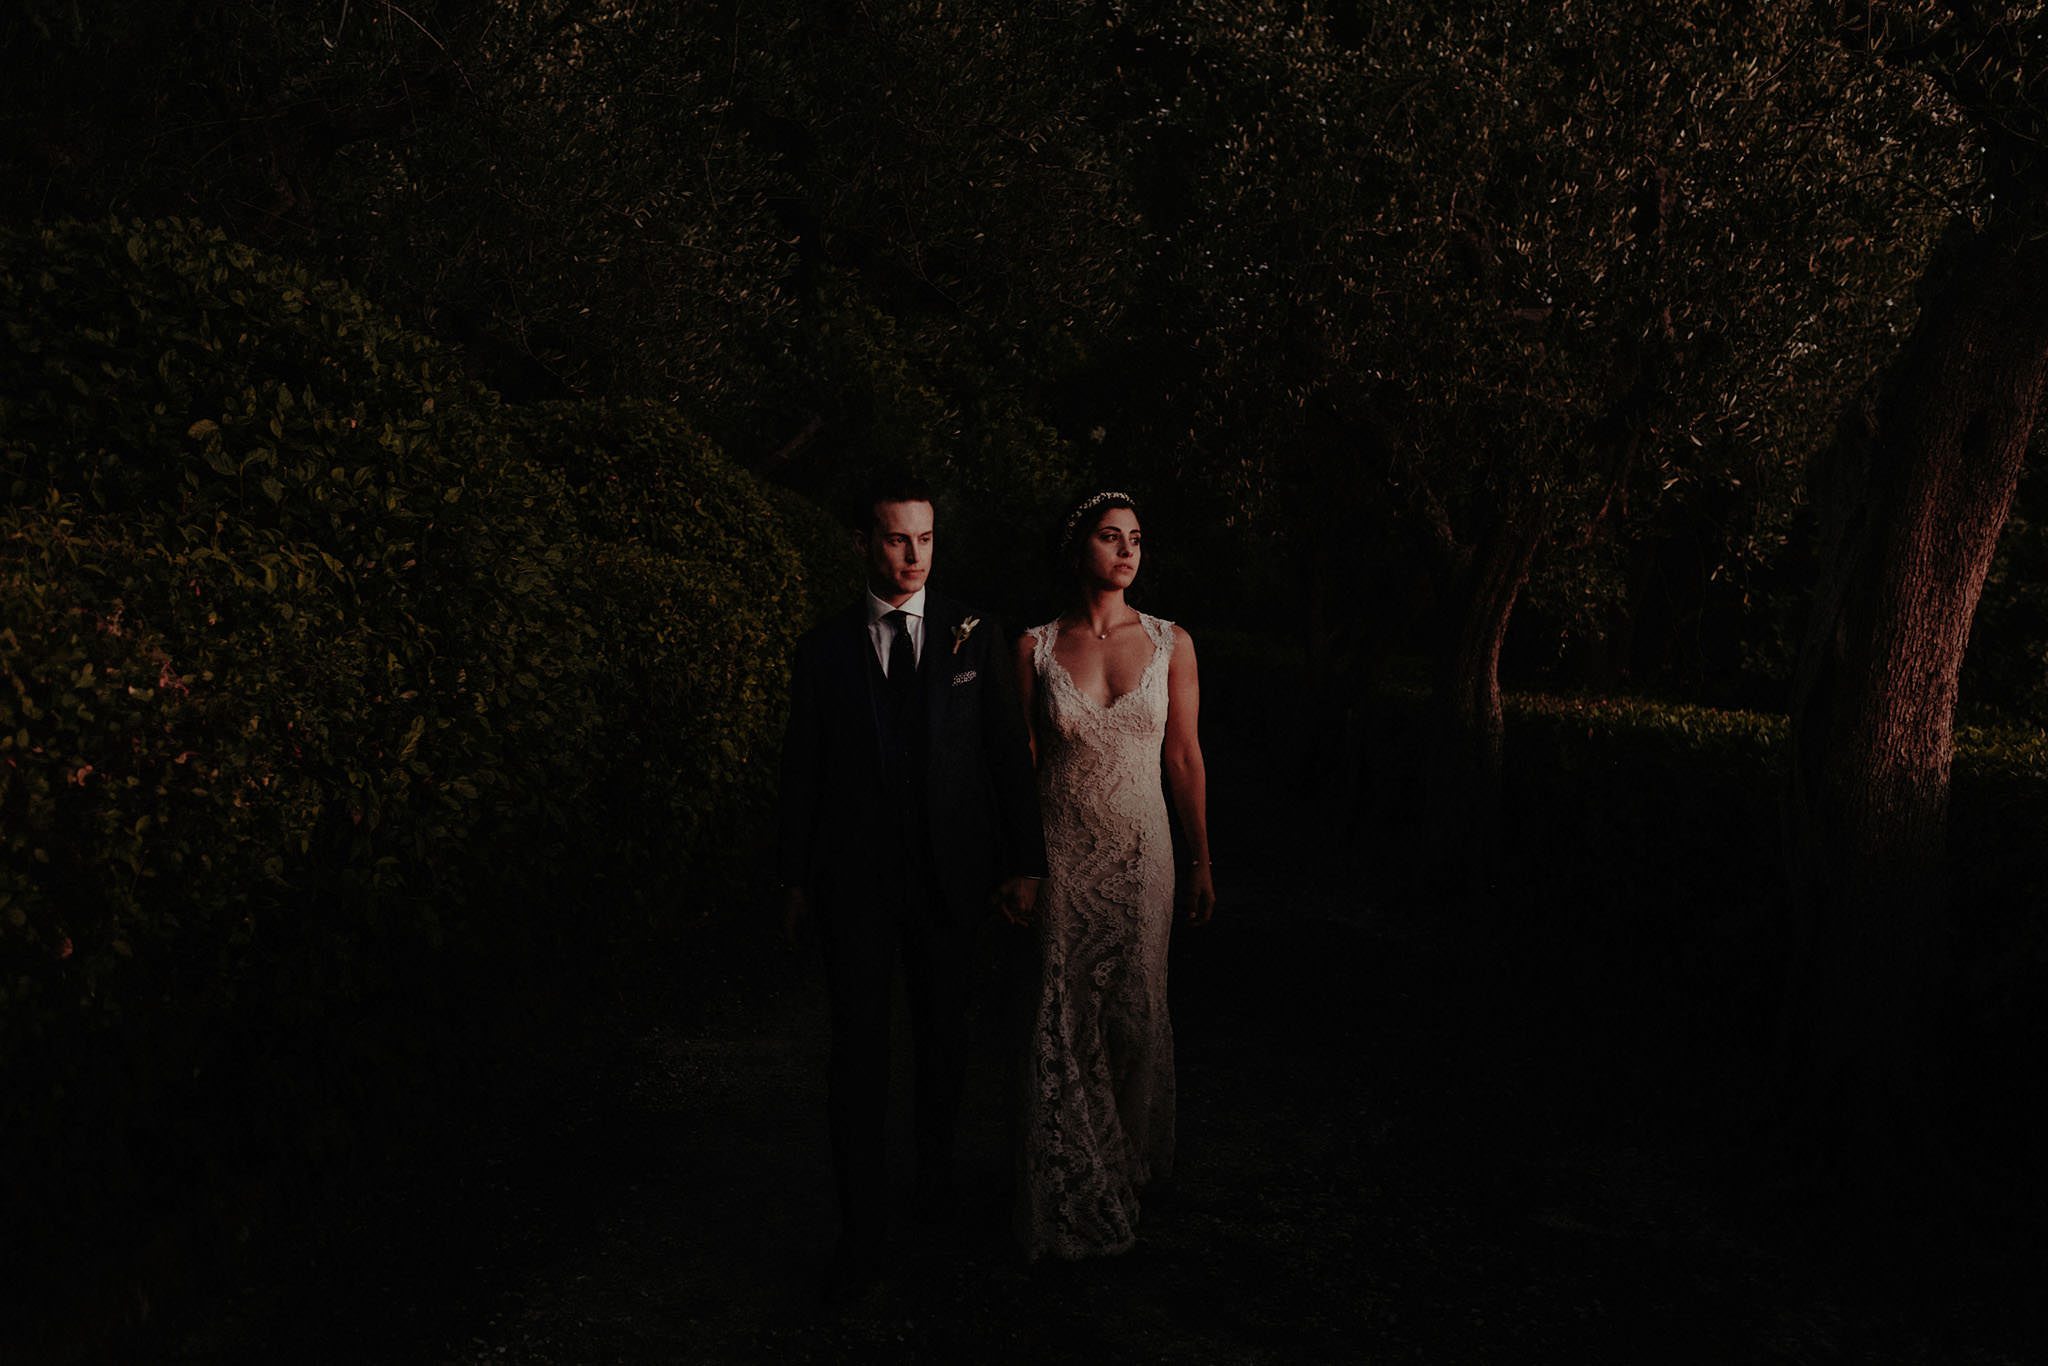 Max-Steph-Italy-Wedding-636.jpg